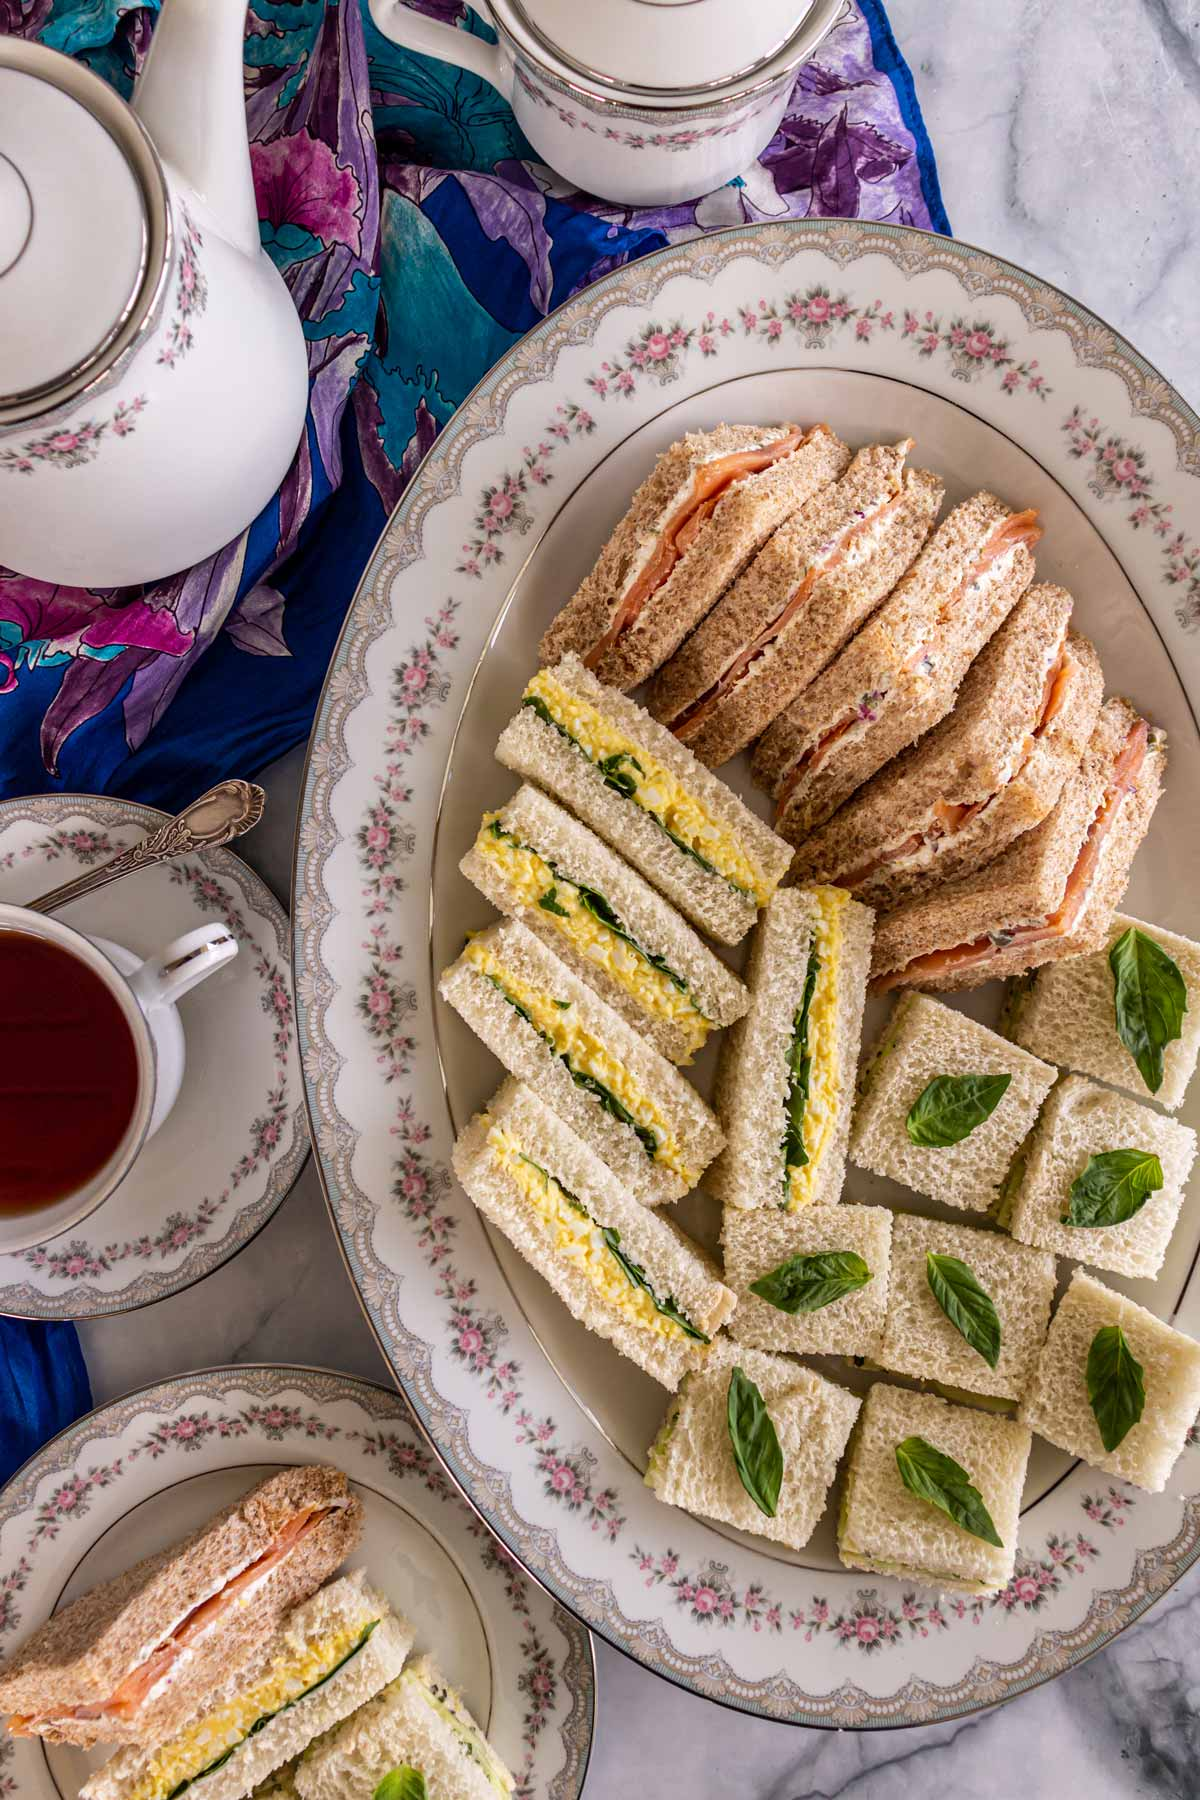 An oval platter of assorted tea sandwiches, a tea pot, and a cup of black tea.